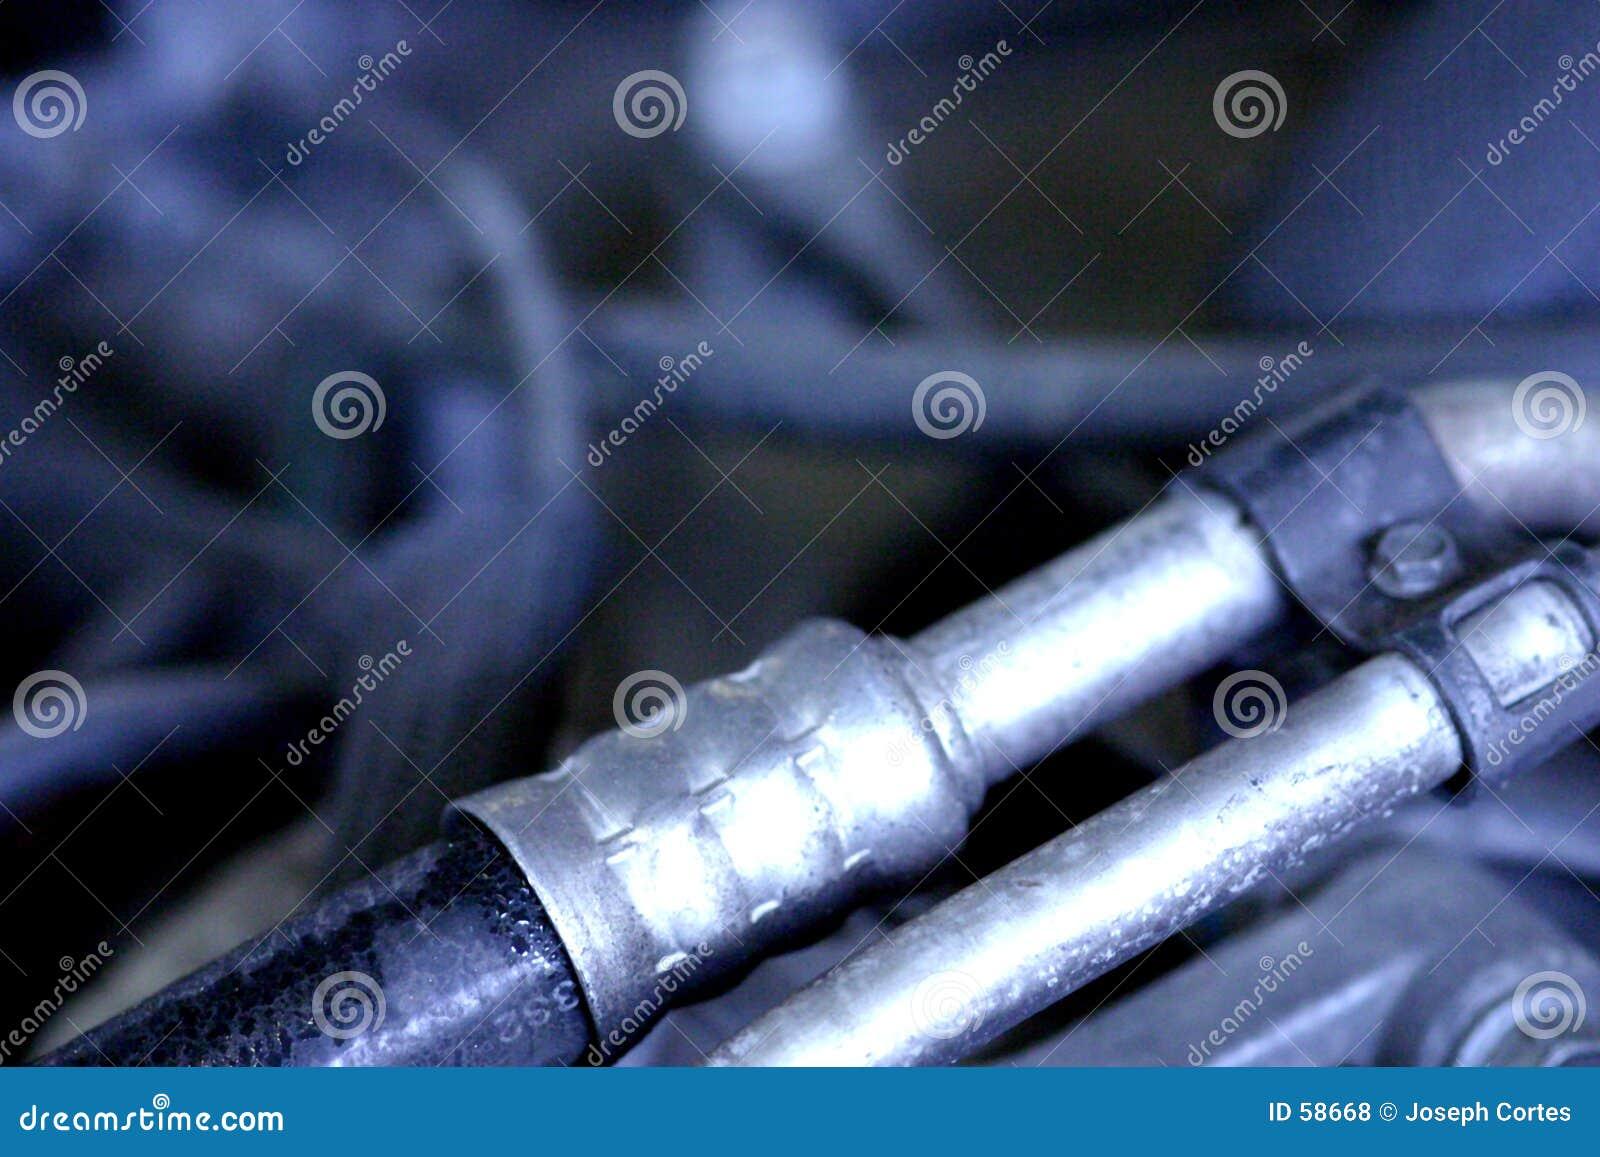 Download μηχανή στοκ εικόνες. εικόνα από σωλήνας, κύκλος, εξάτμιση - 58668